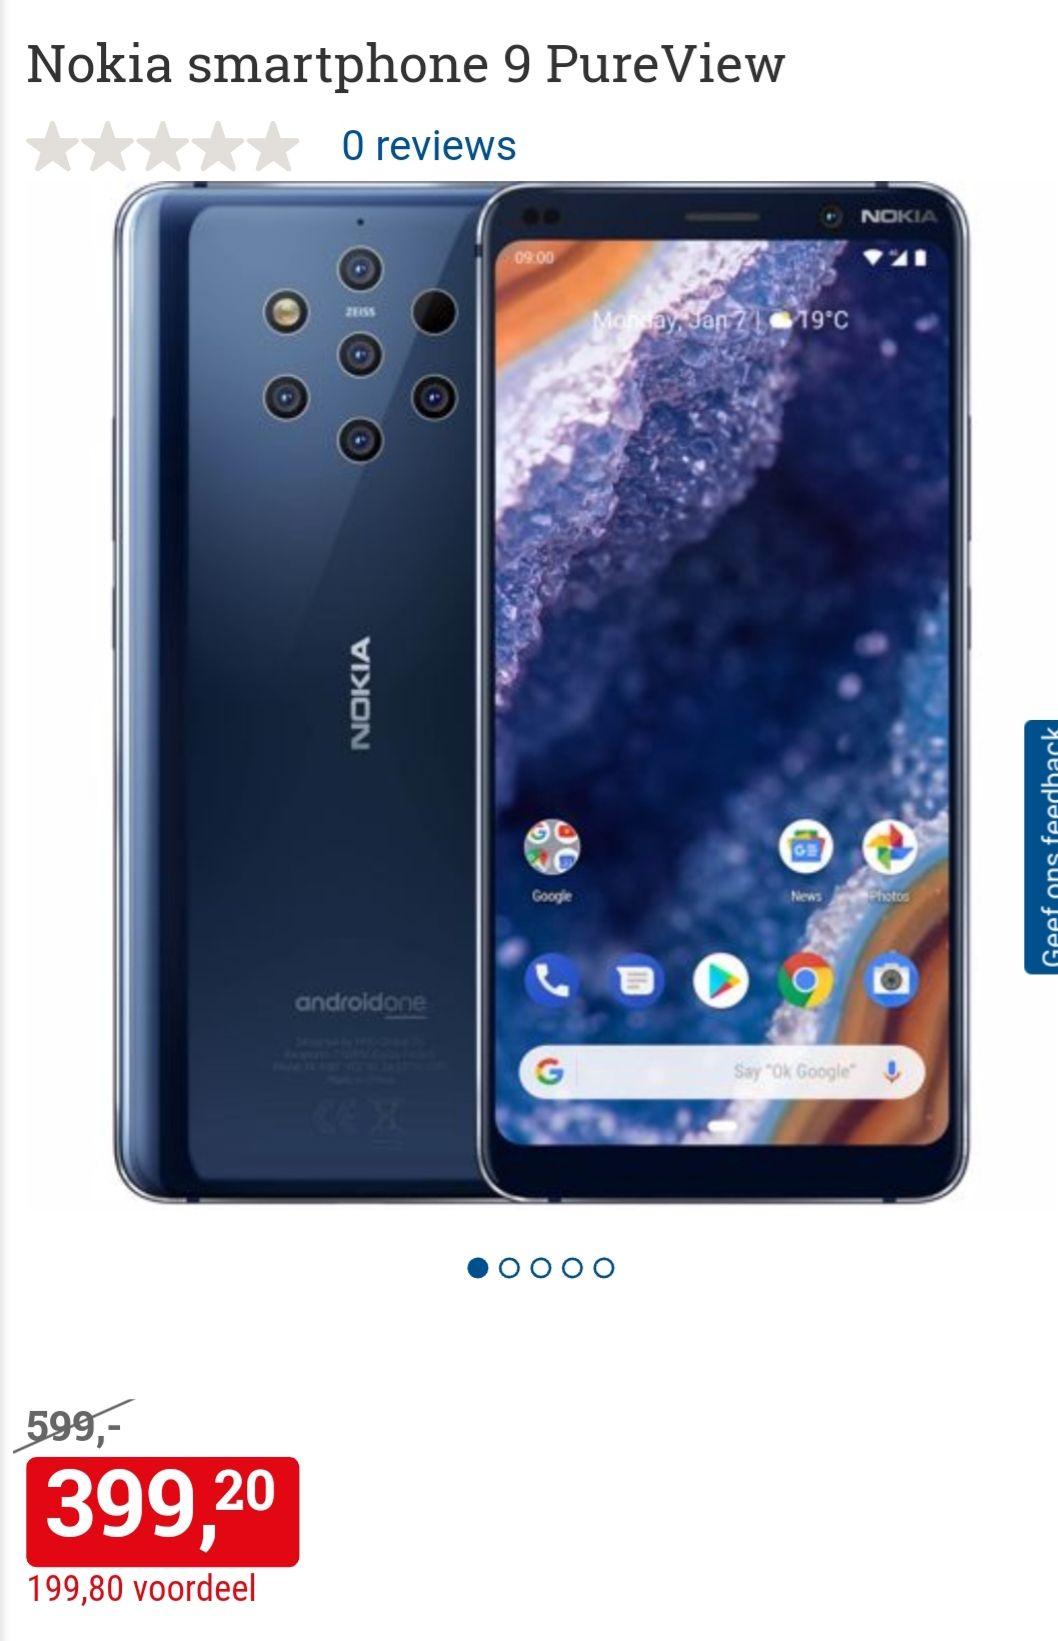 Nokia 9 PureView € 399,- @ BCC, elders vanaf € 489